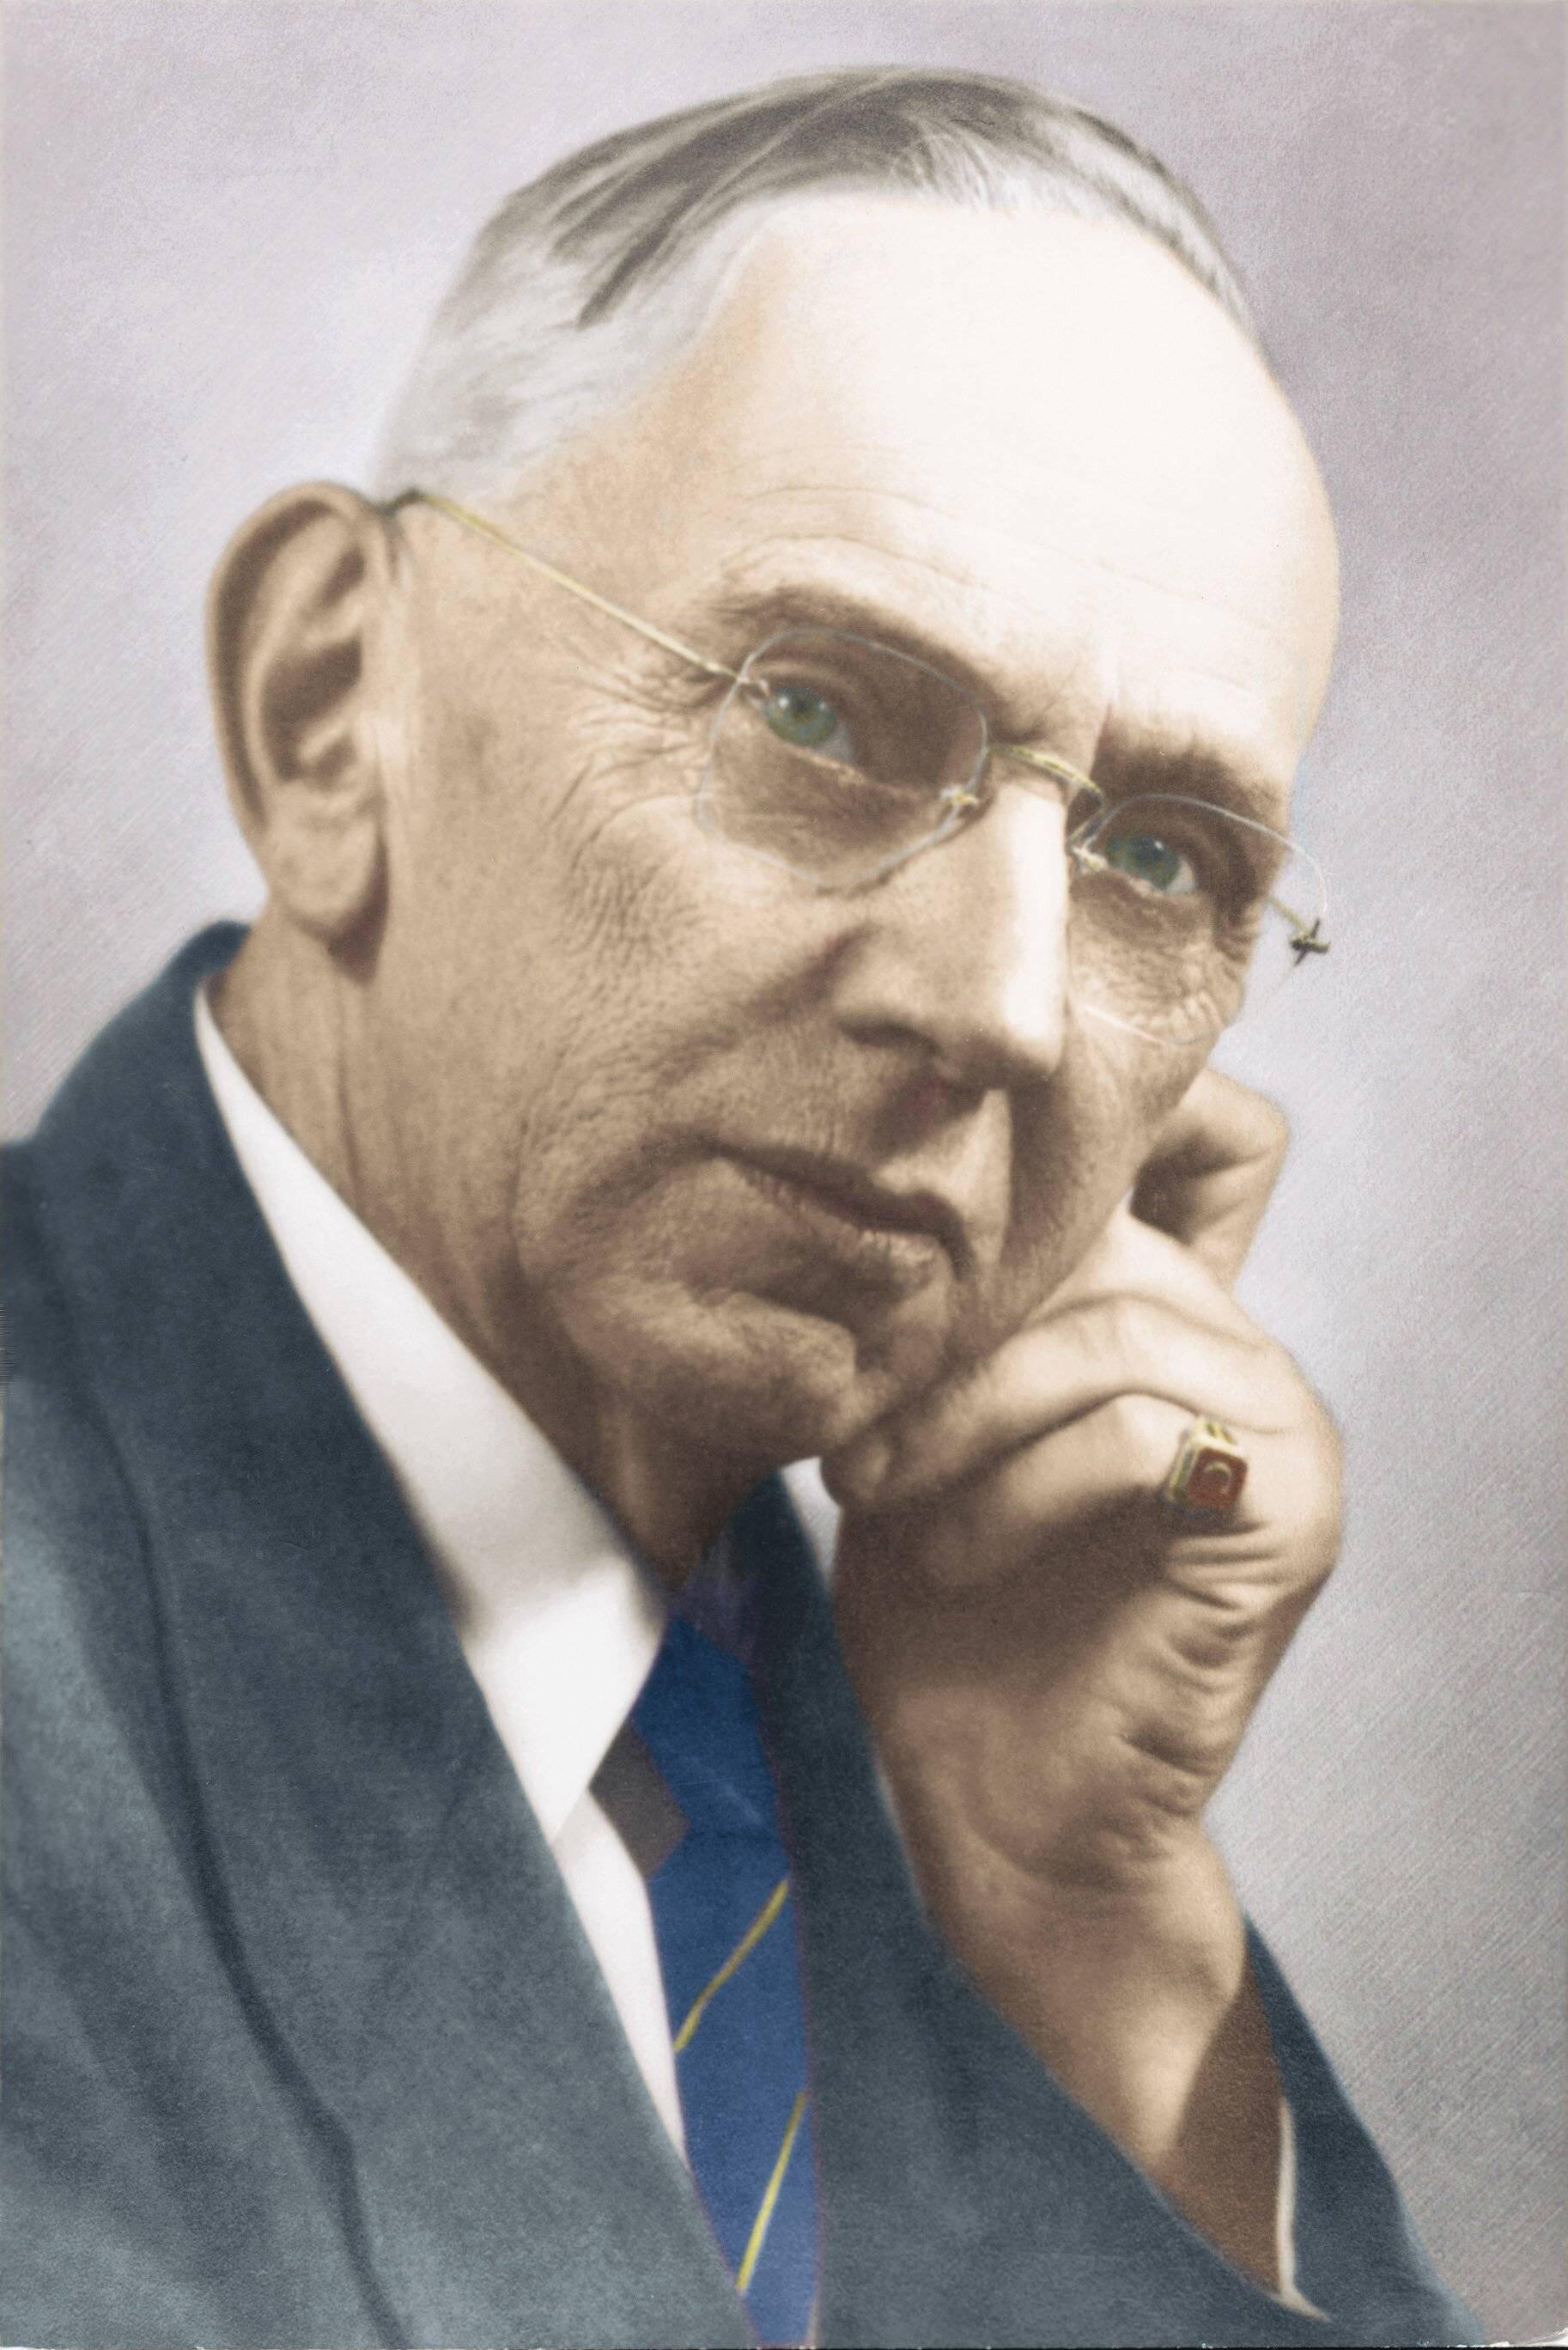 Эдвард кейси – биография, книги, предсказания, вклад в историю